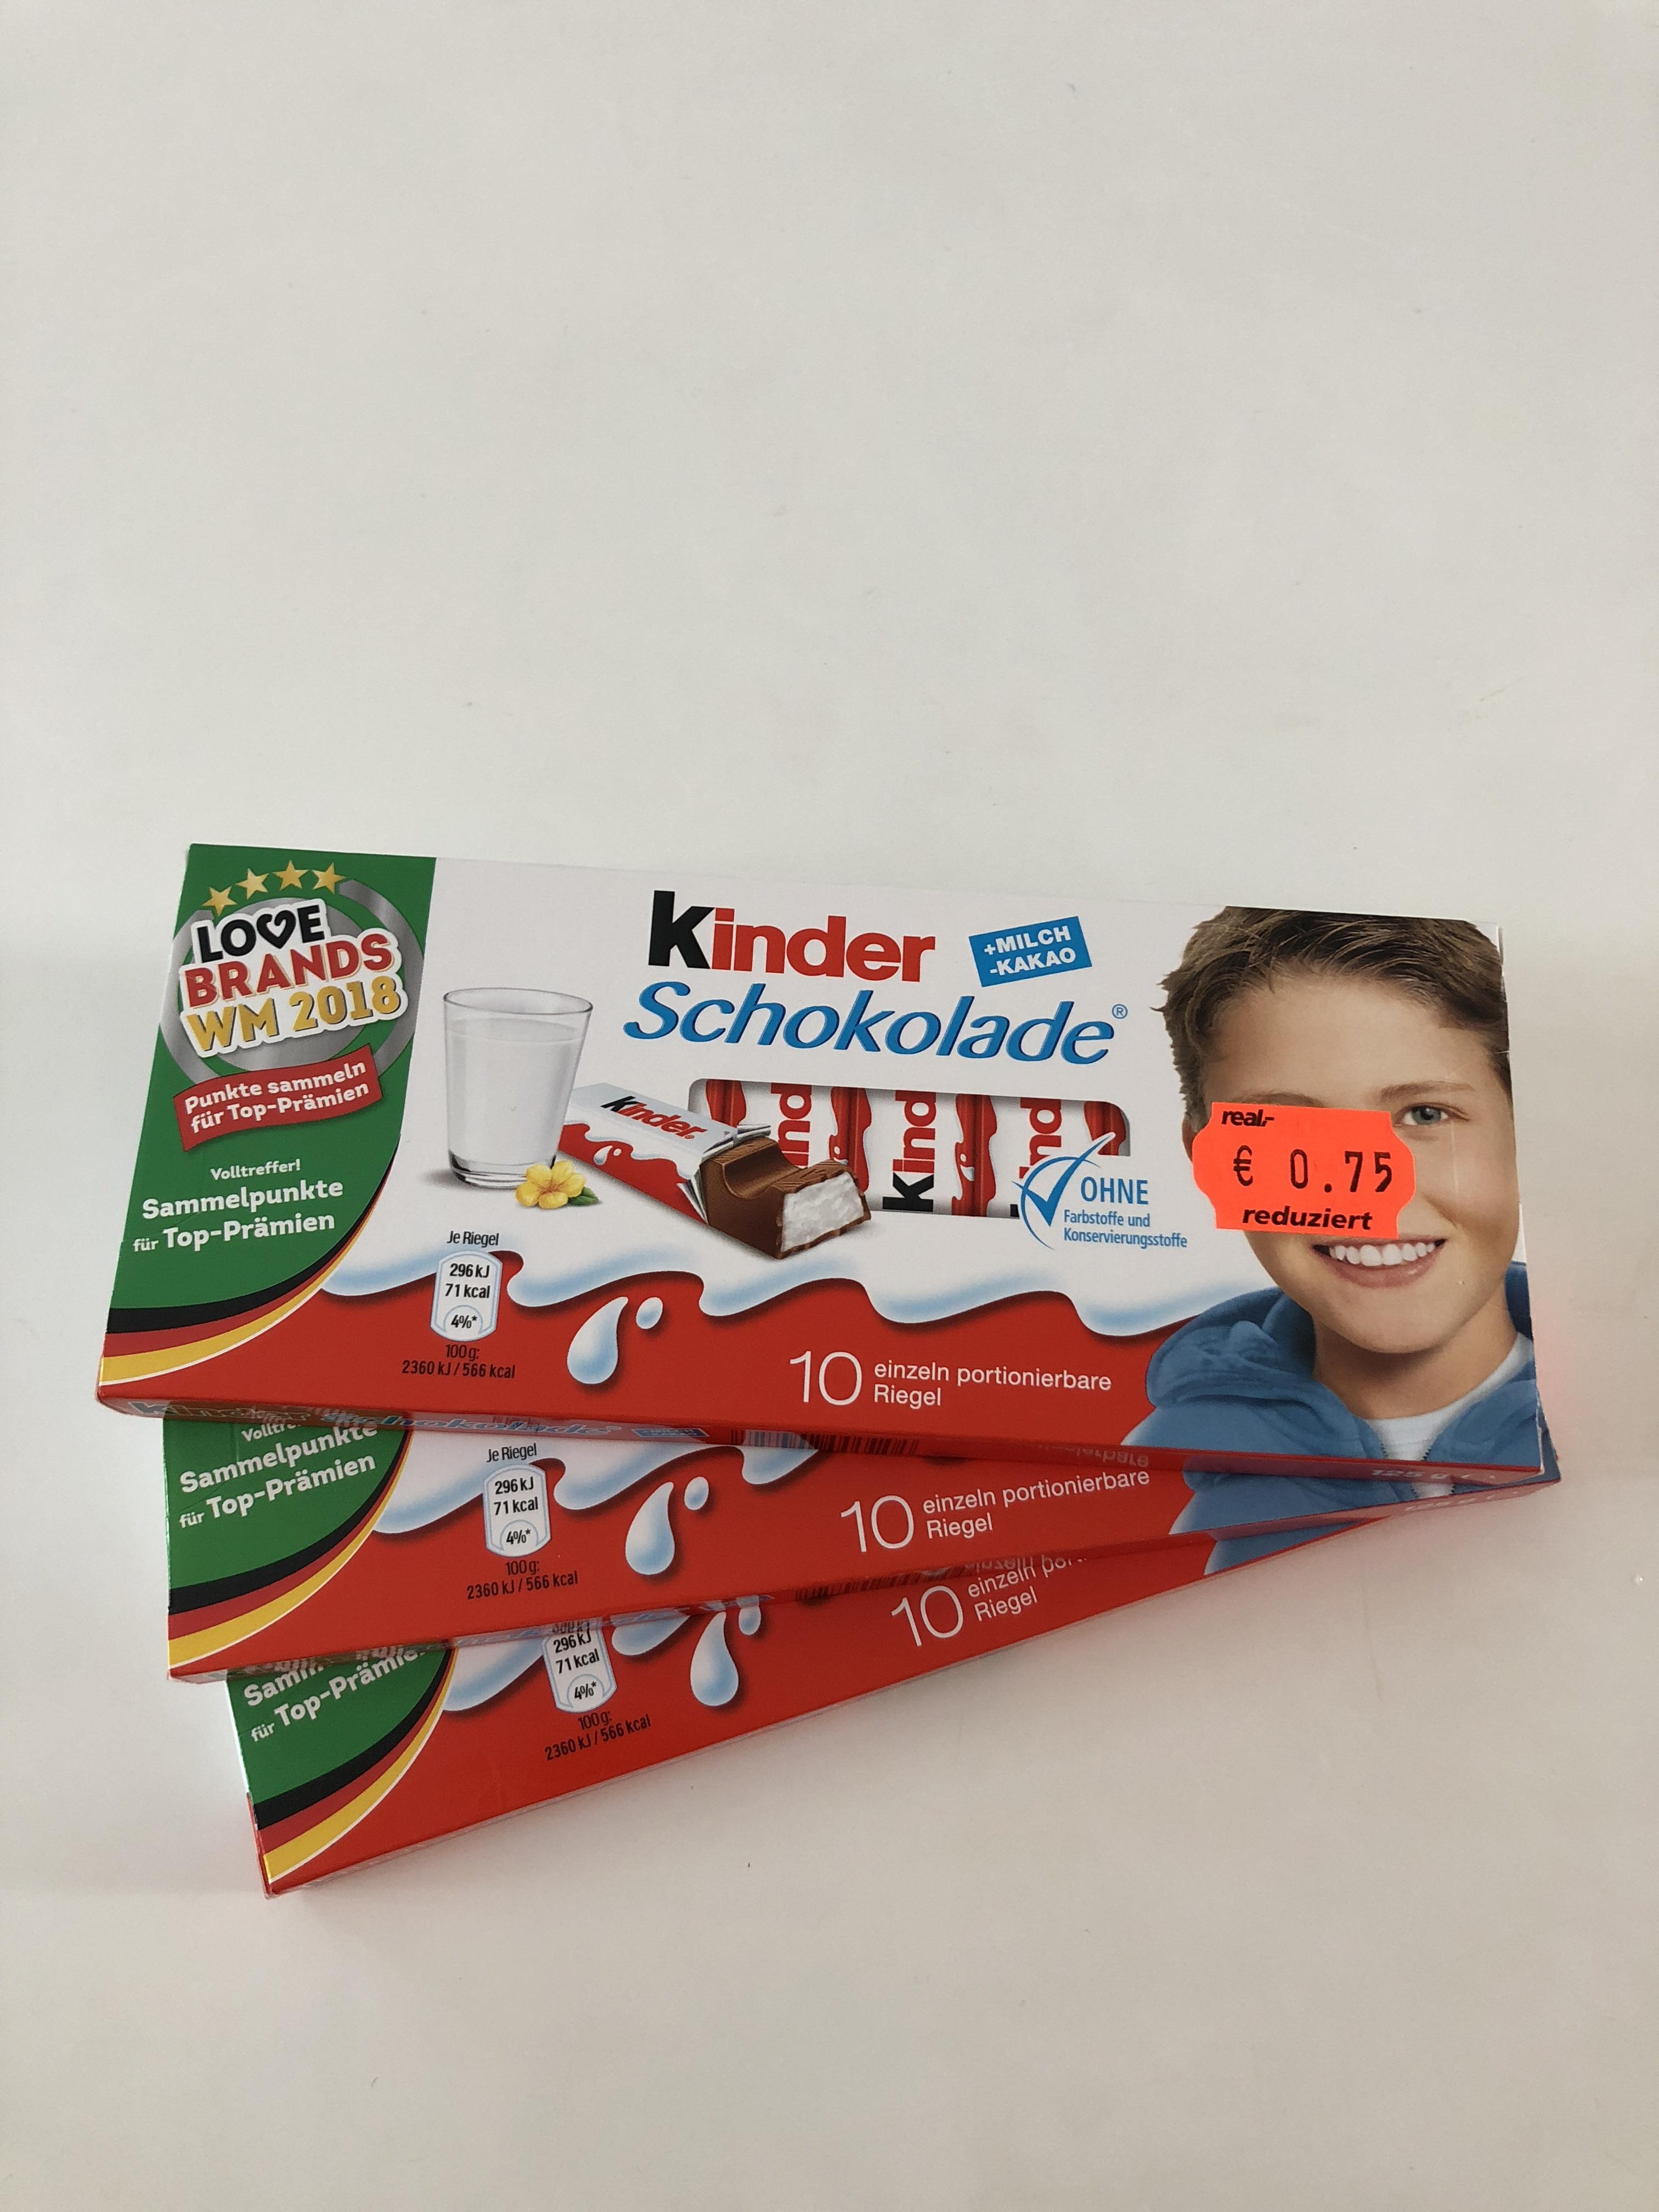 [Lokal] Real in Rheydt Kinderschokolade 10er Packung für 75 Ct